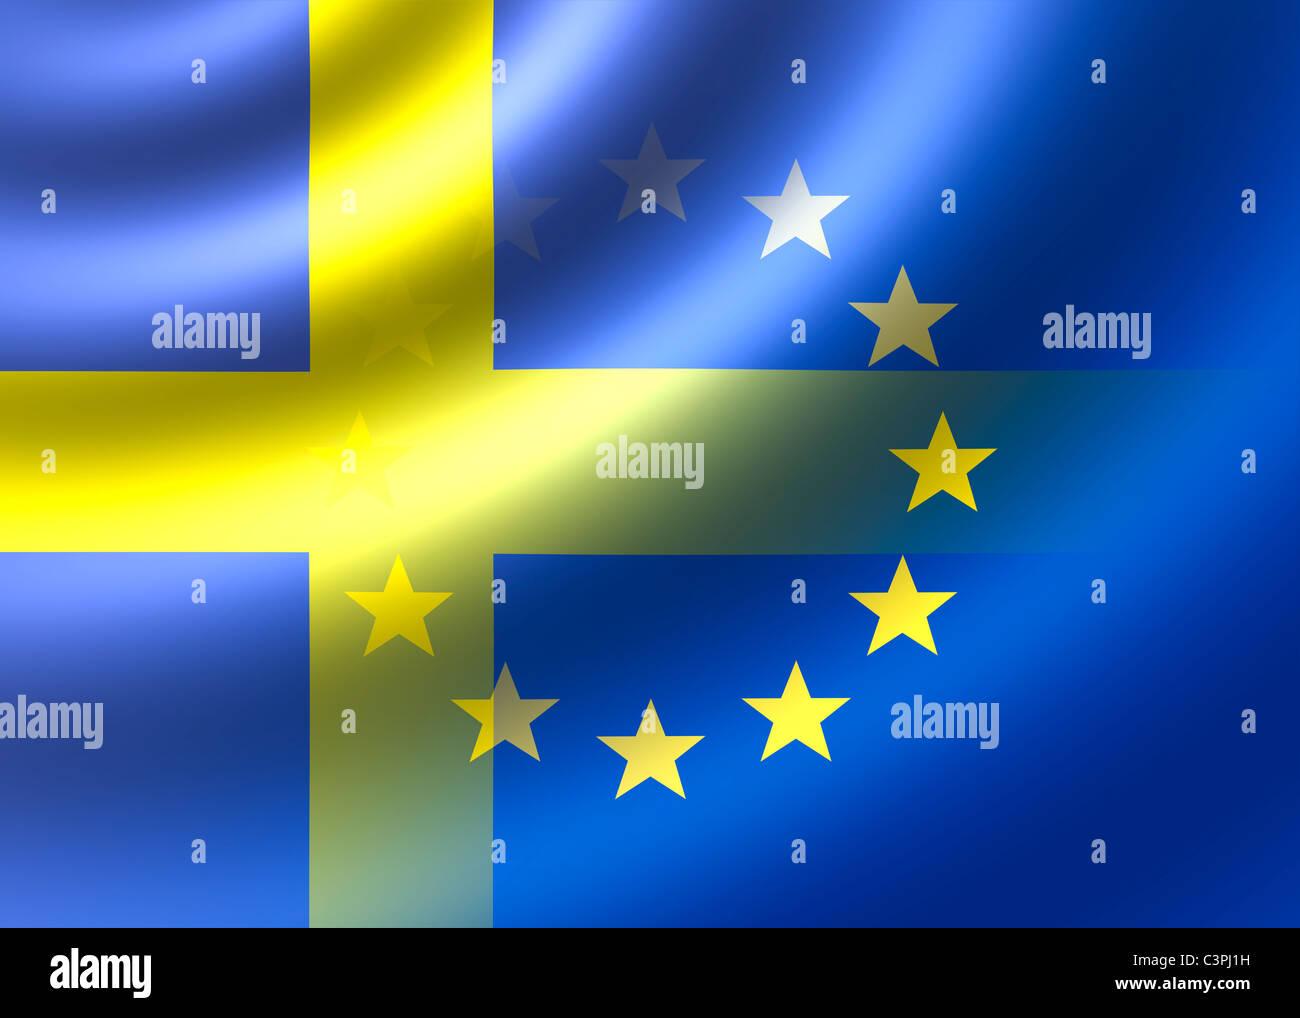 Is Sweden In The Eu